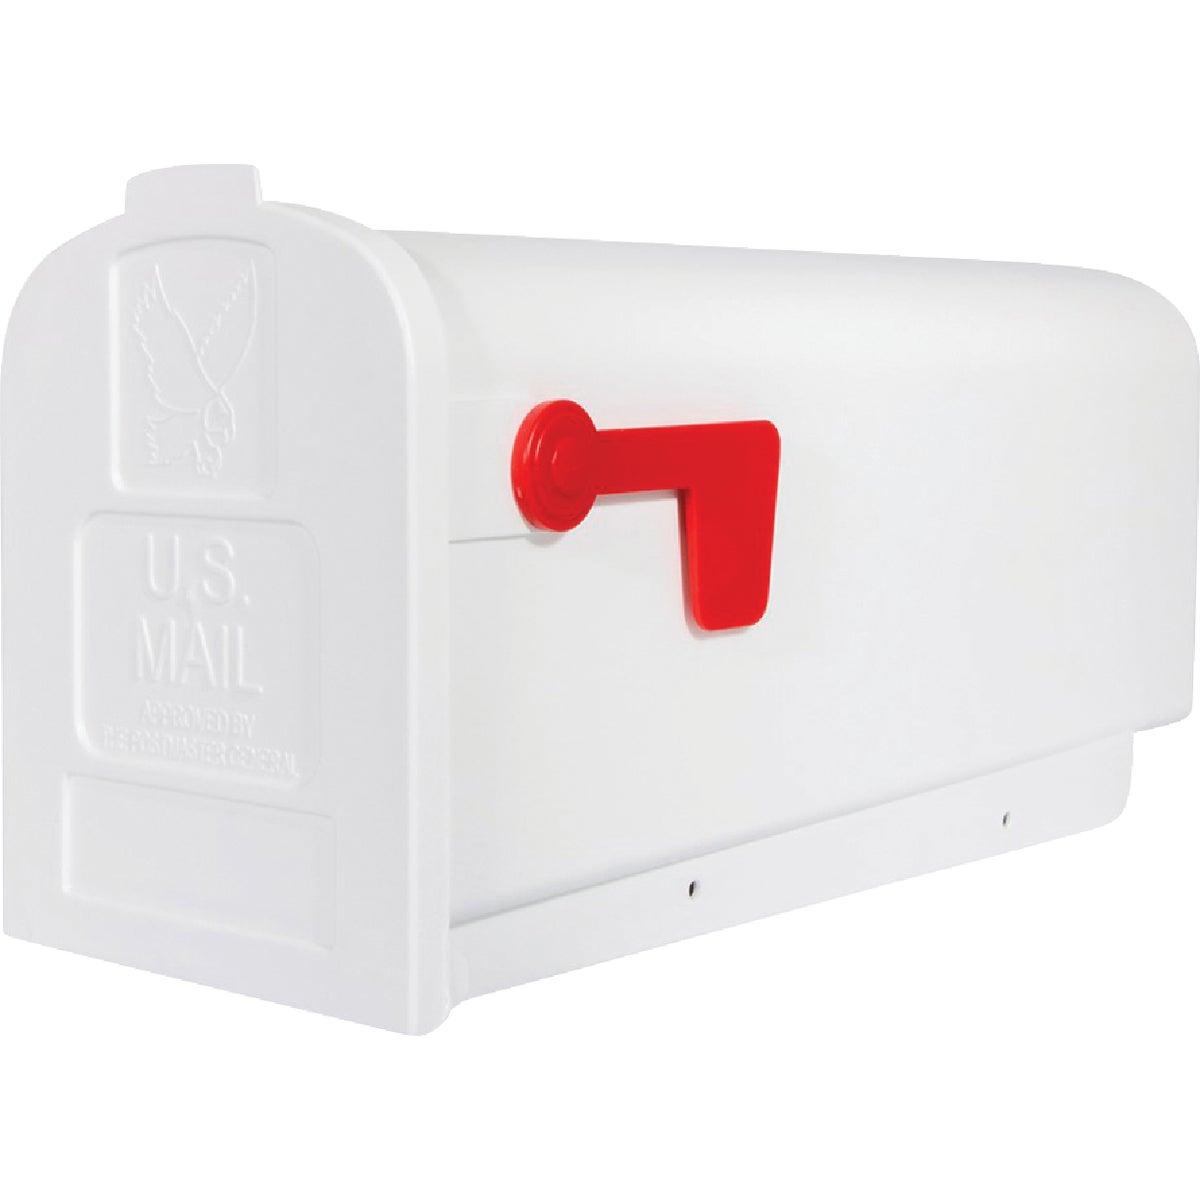 Flambeau Prod. #1 WHITE POLY MAILBOX T-R4503WT